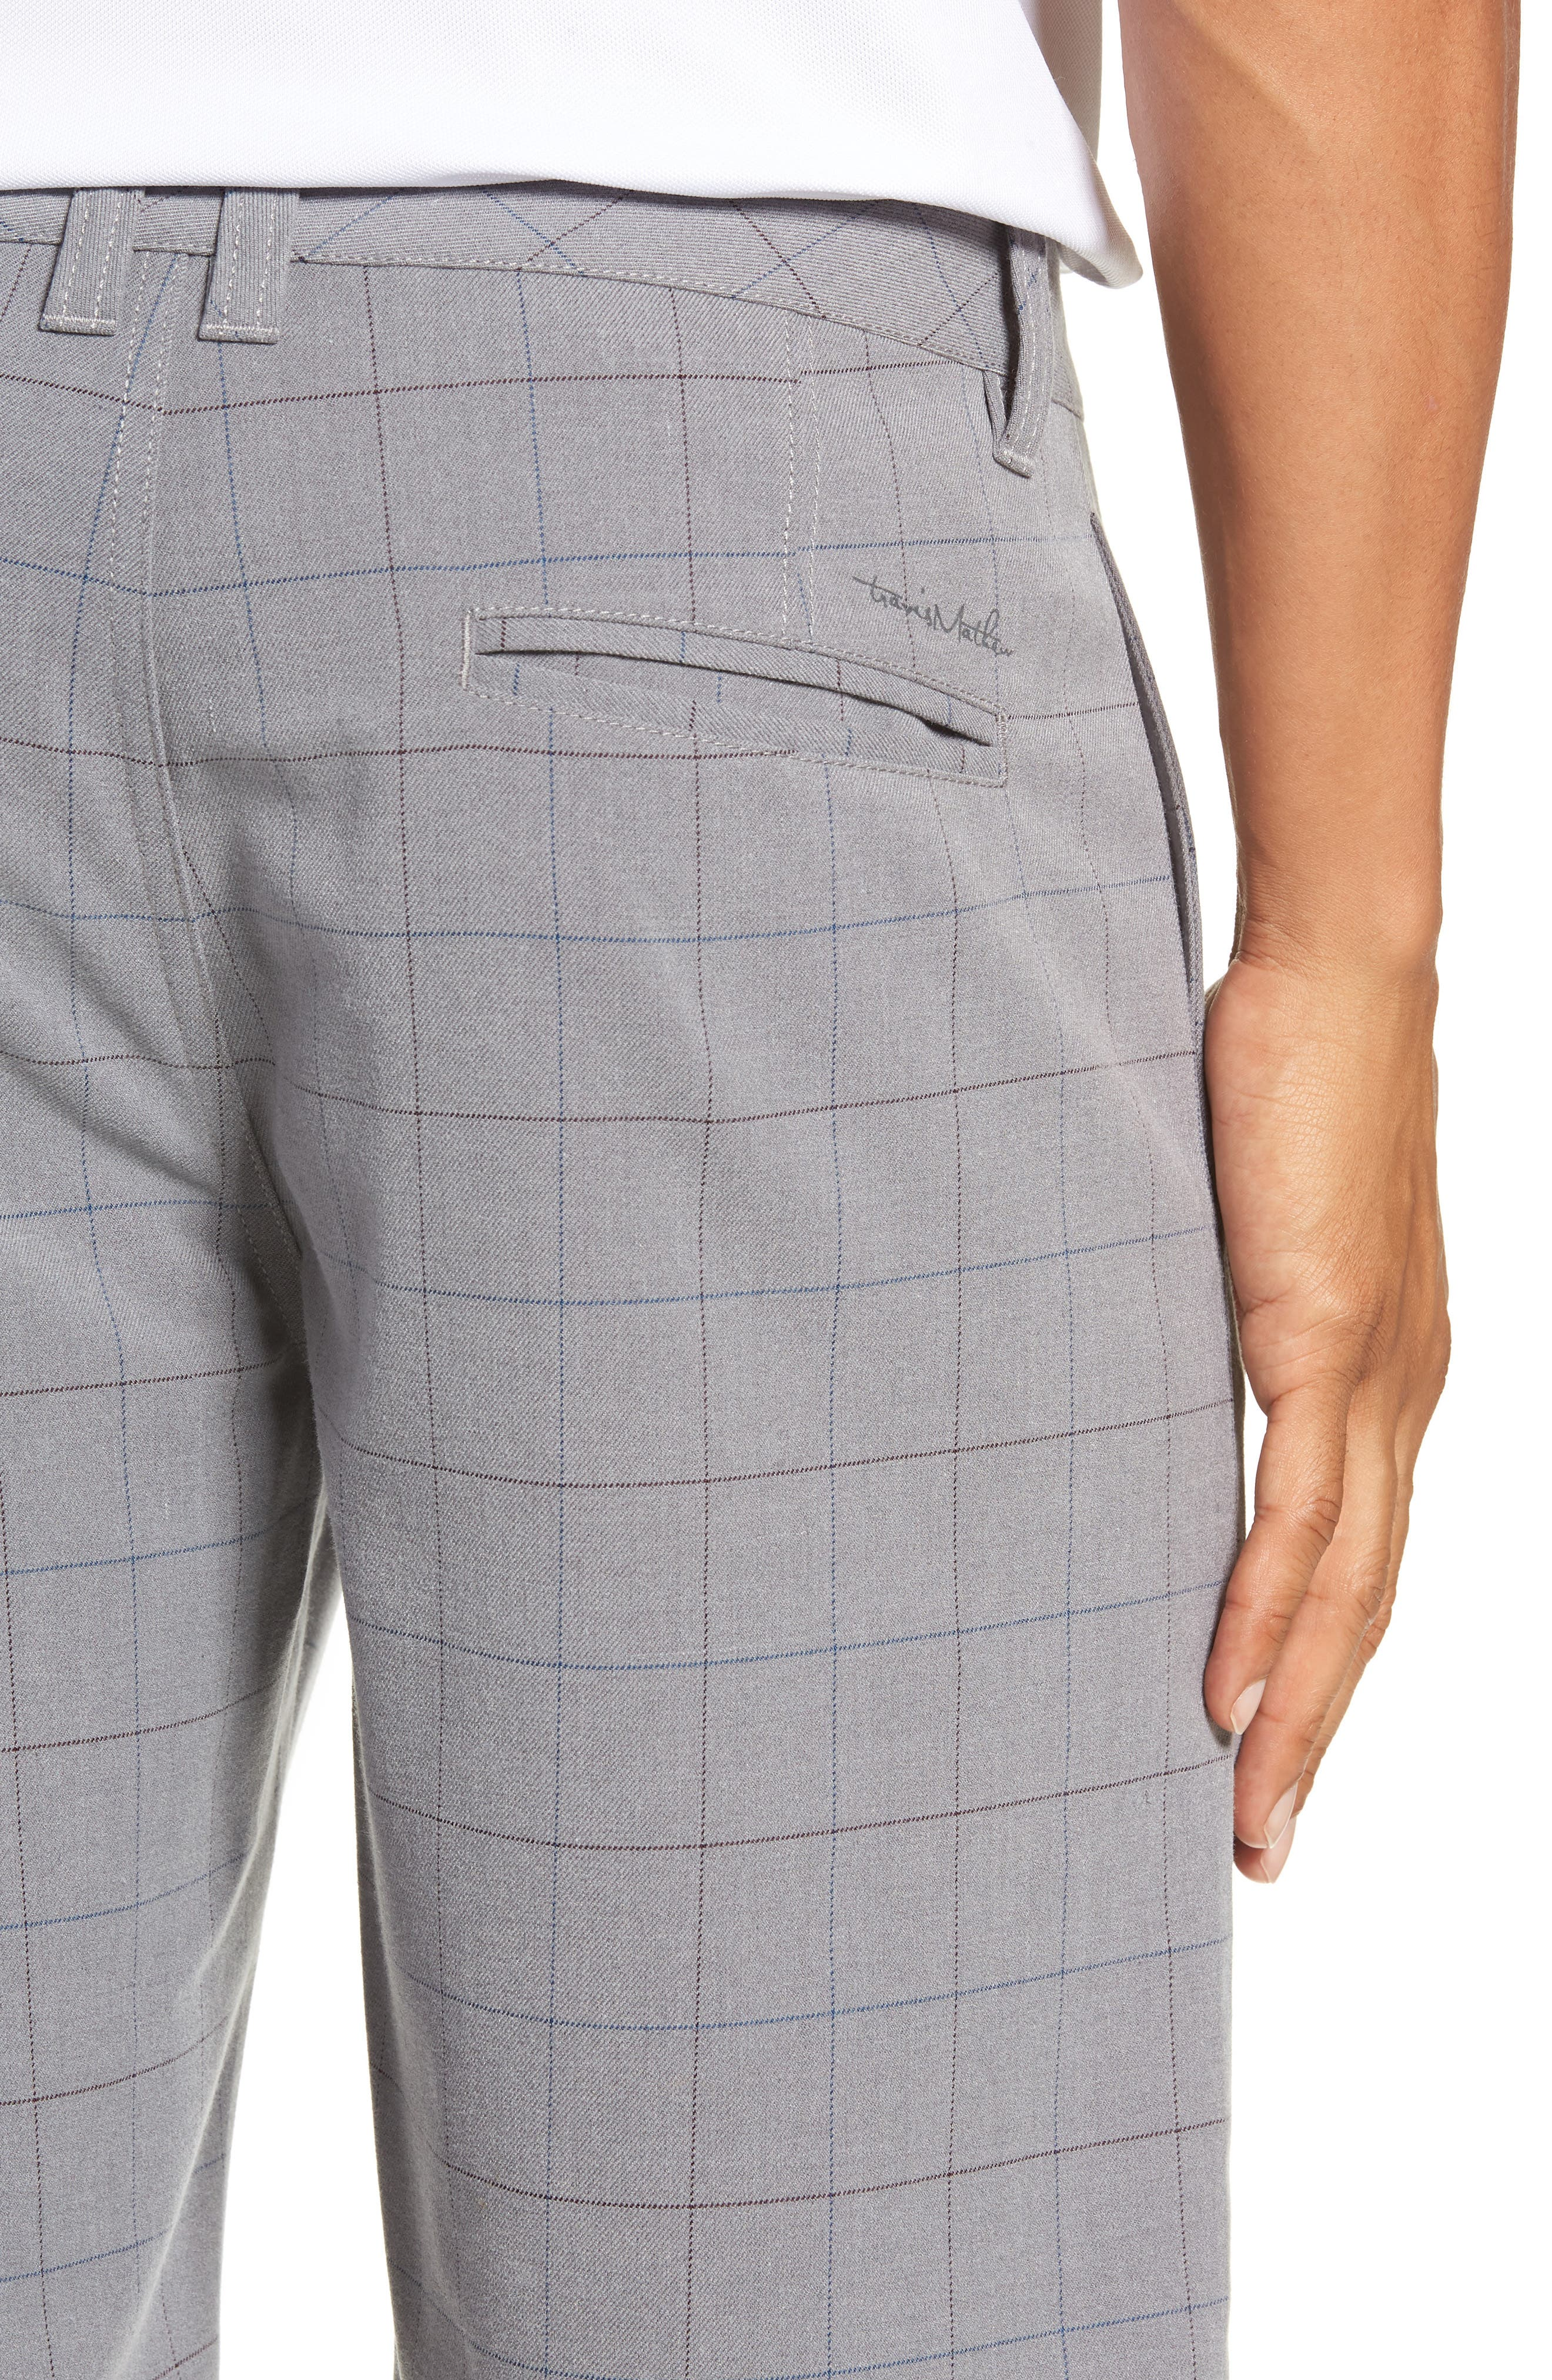 Rickles Regular Fit Shorts,                             Alternate thumbnail 4, color,                             020